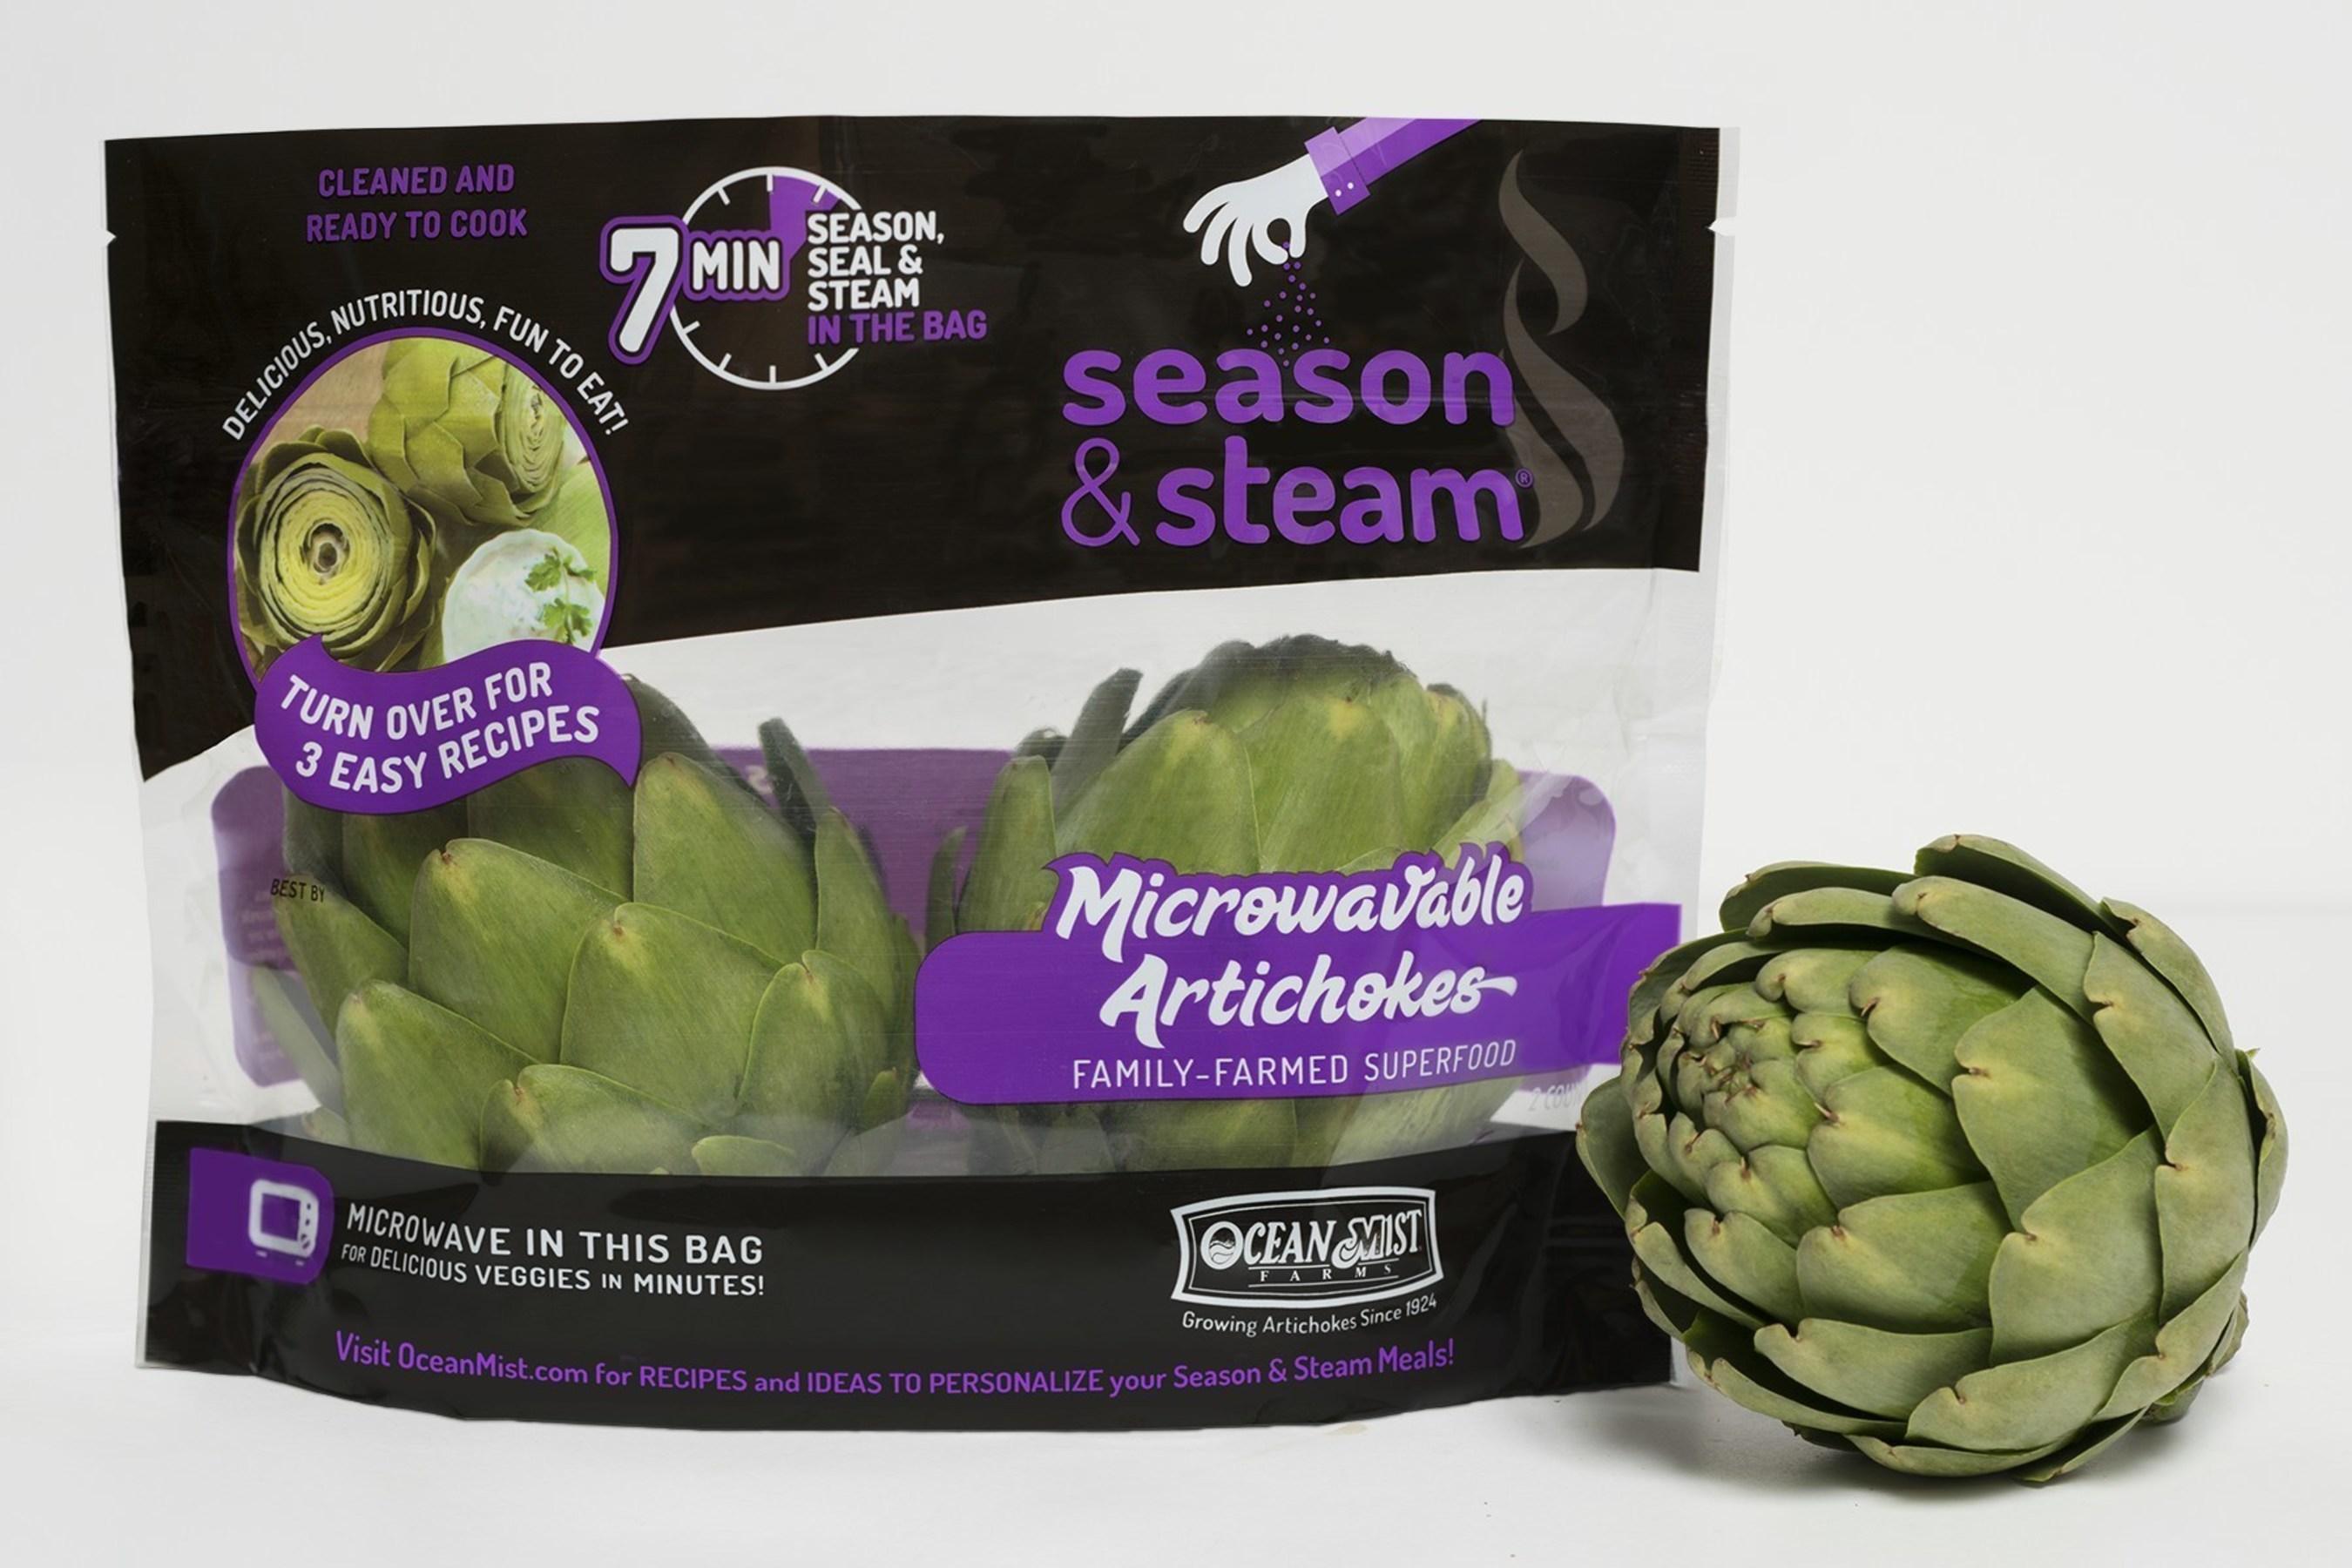 Ocean Mist Farms Season & Steam Microwaveable Artichokes